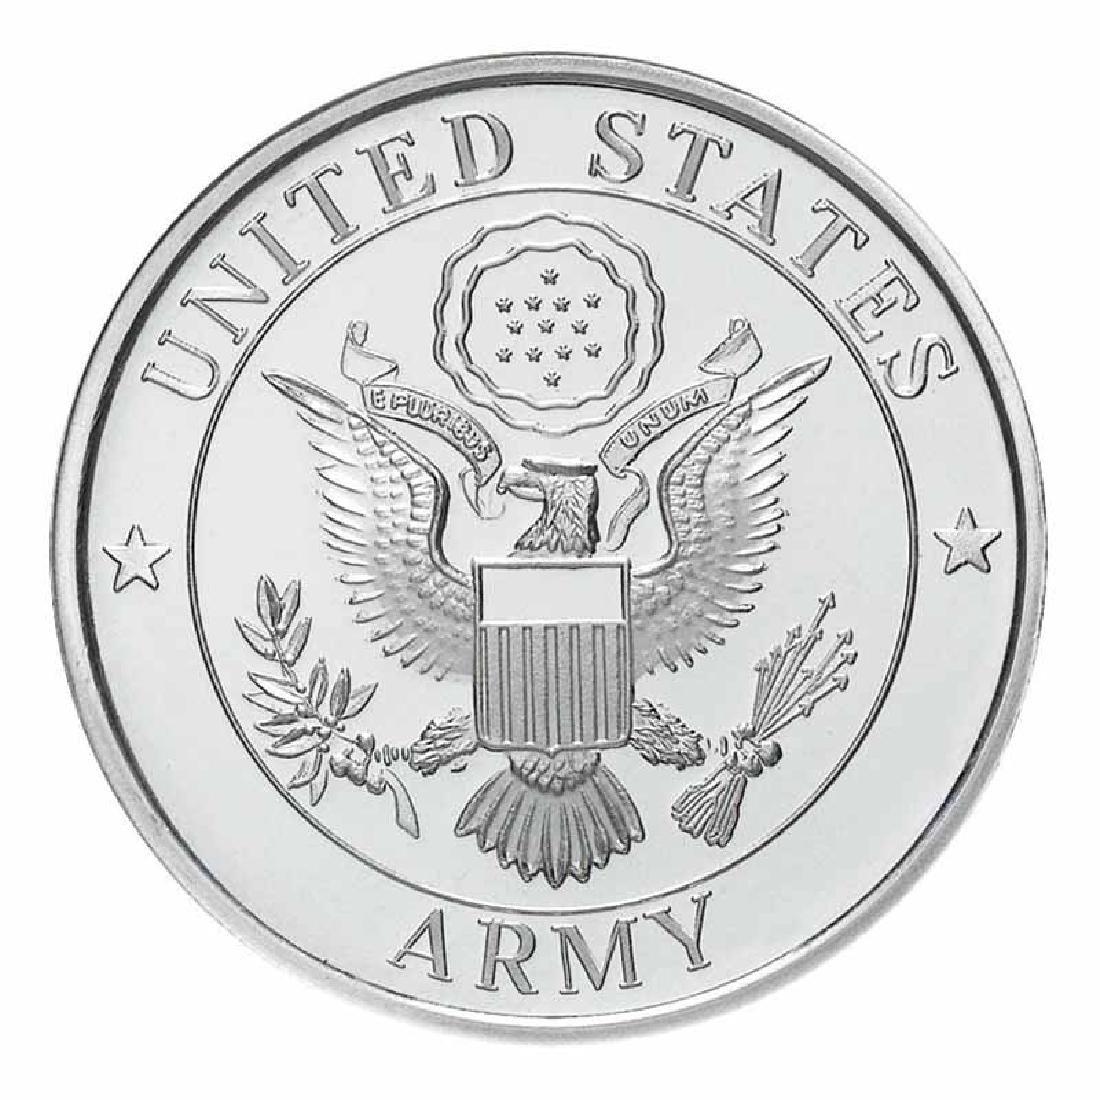 US Army .999 Silver 1 oz Round